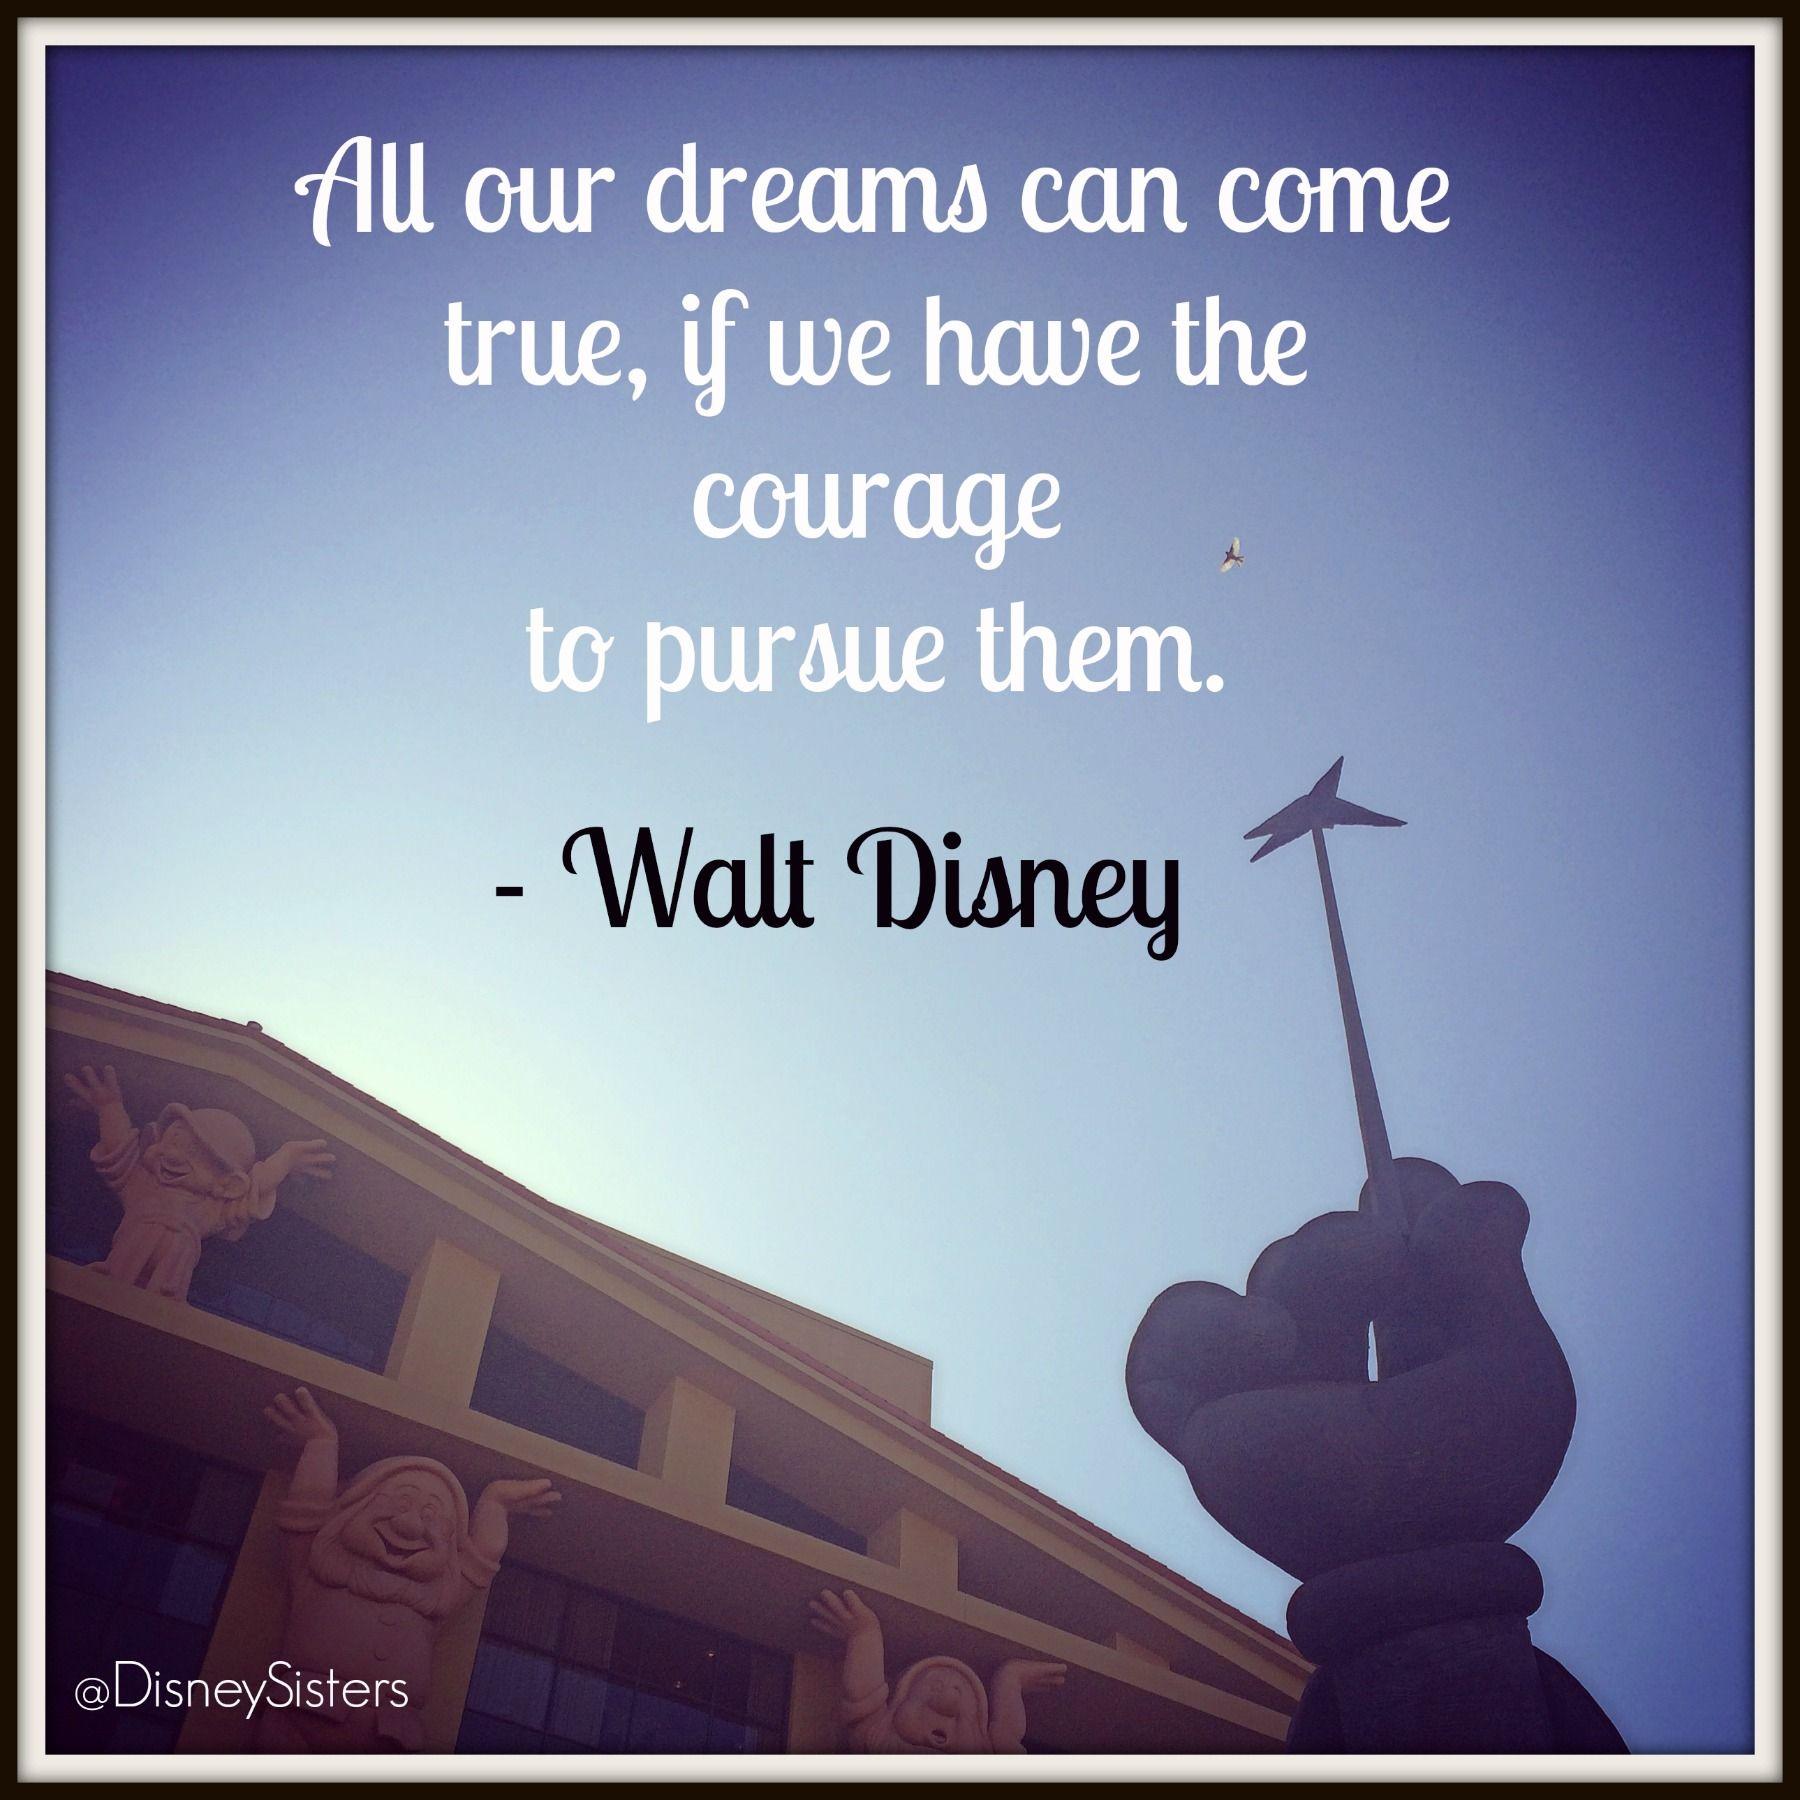 Walt Disney Quotes To Inspire Graduates | Disney, Graduation and ...